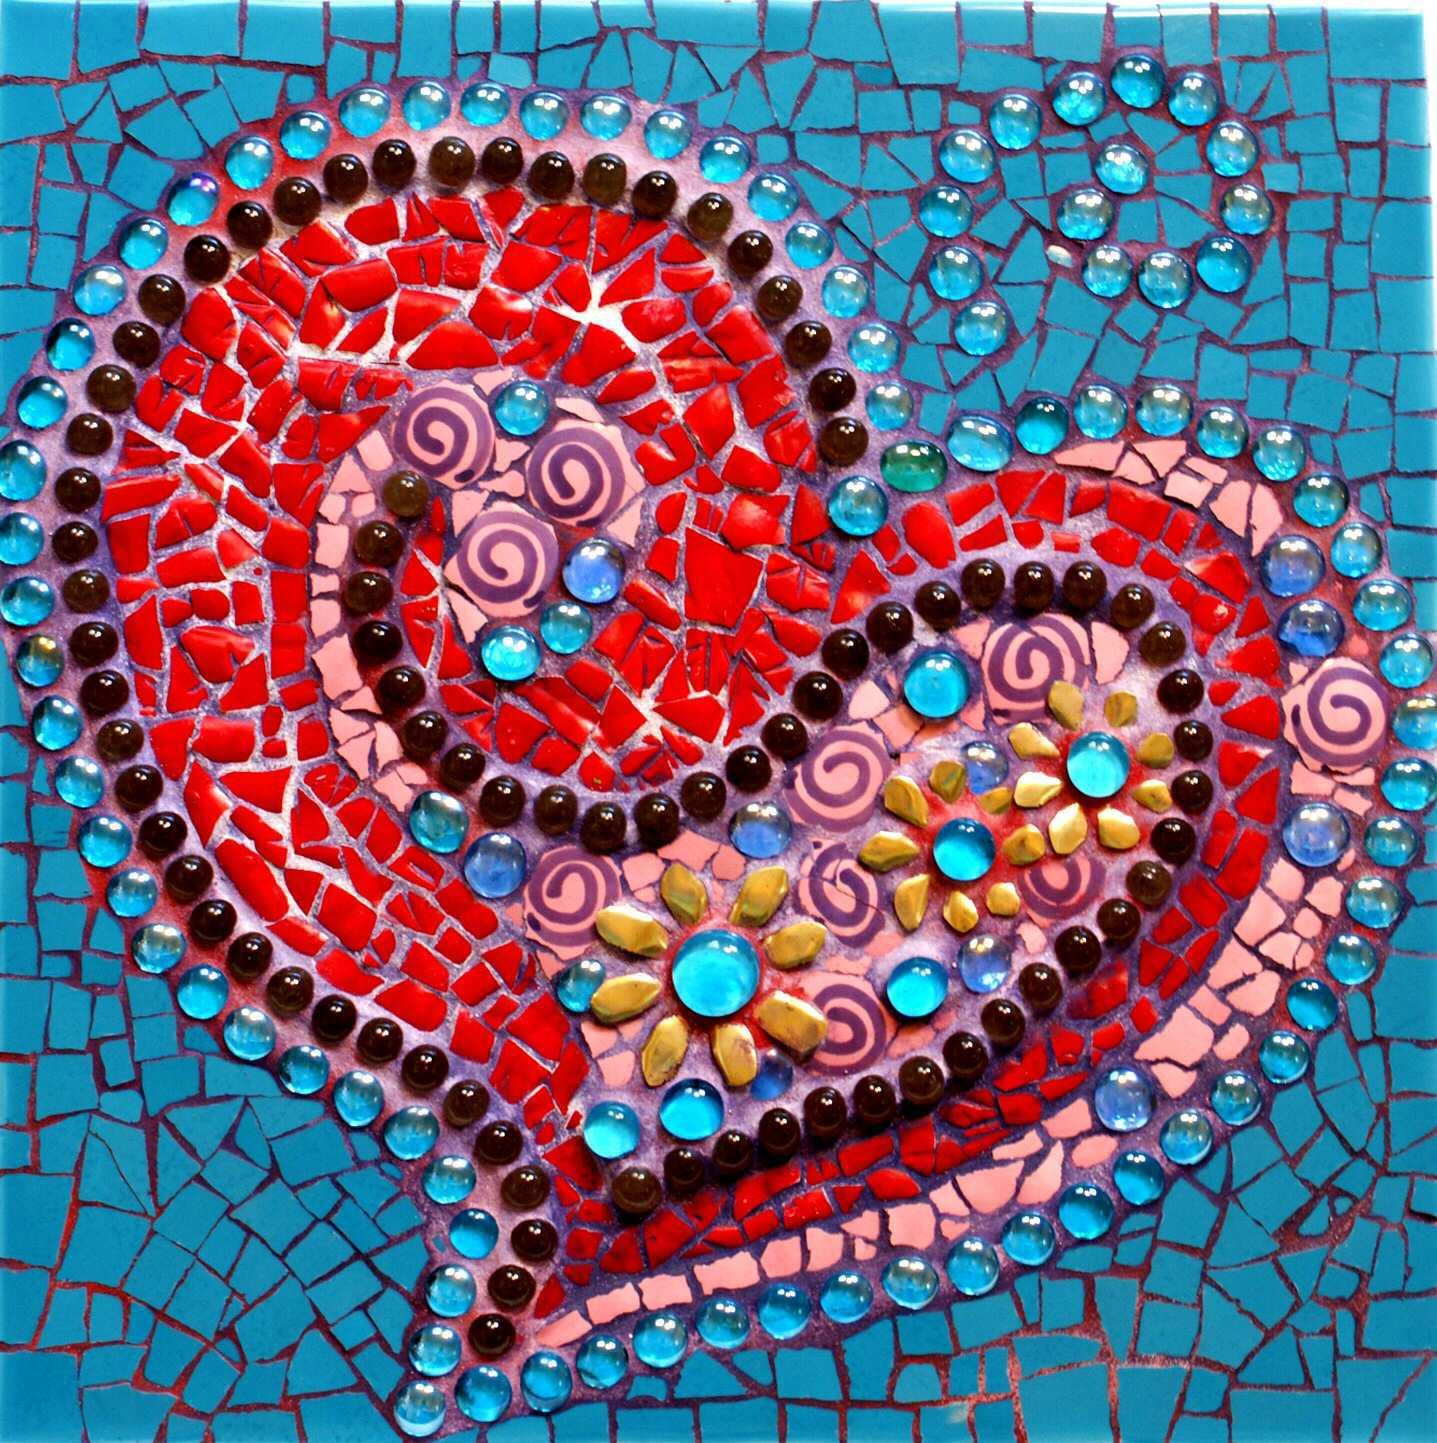 Bodacious-Heart-Square-Mosaic